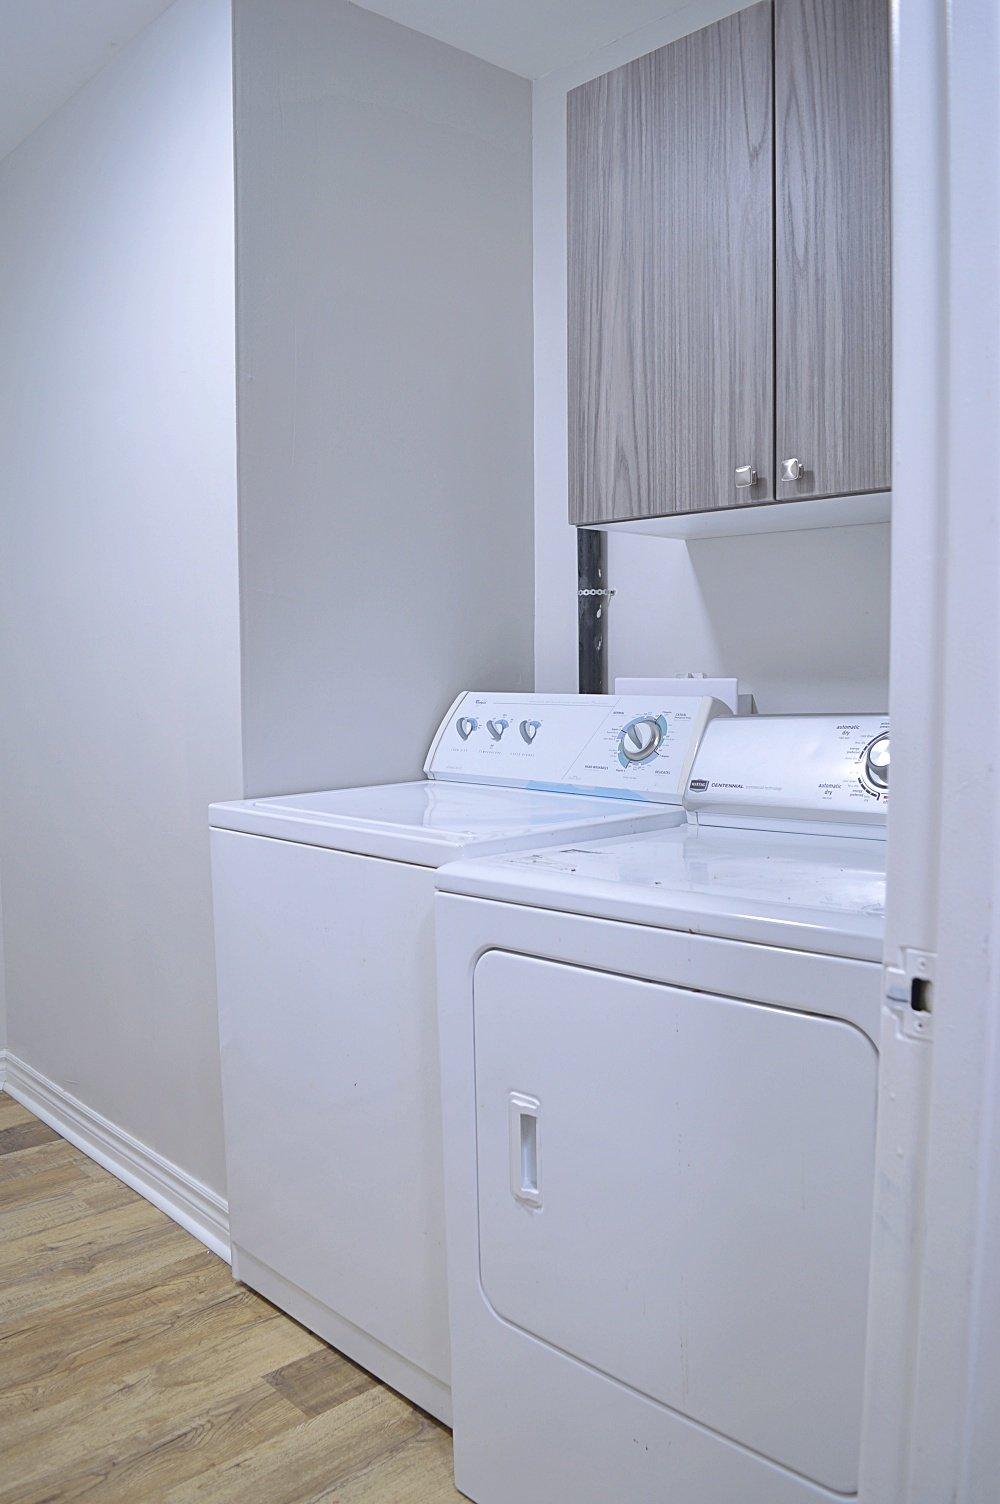 rental property laundry room renovation